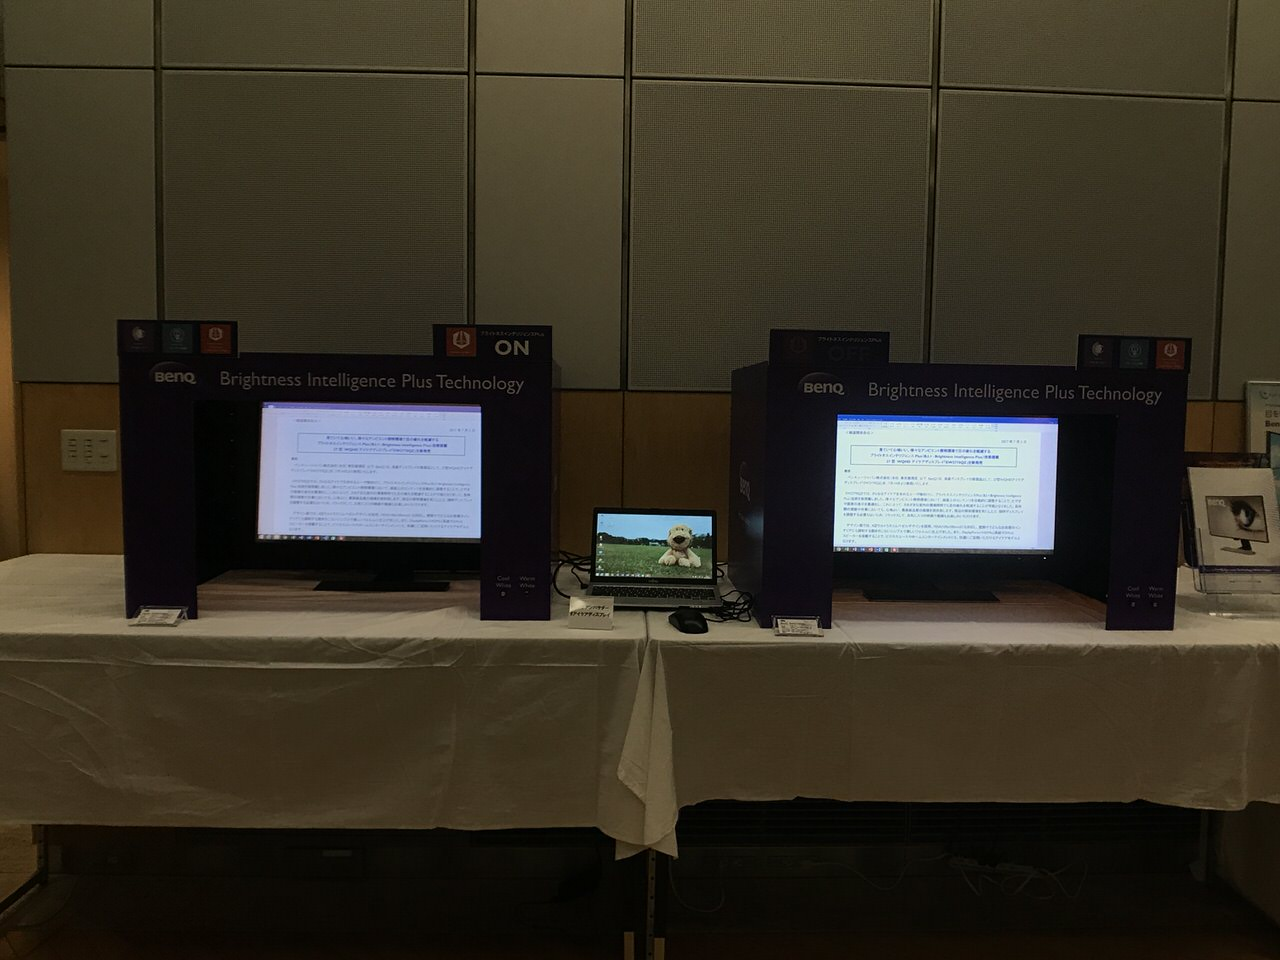 Benq monitor 8249